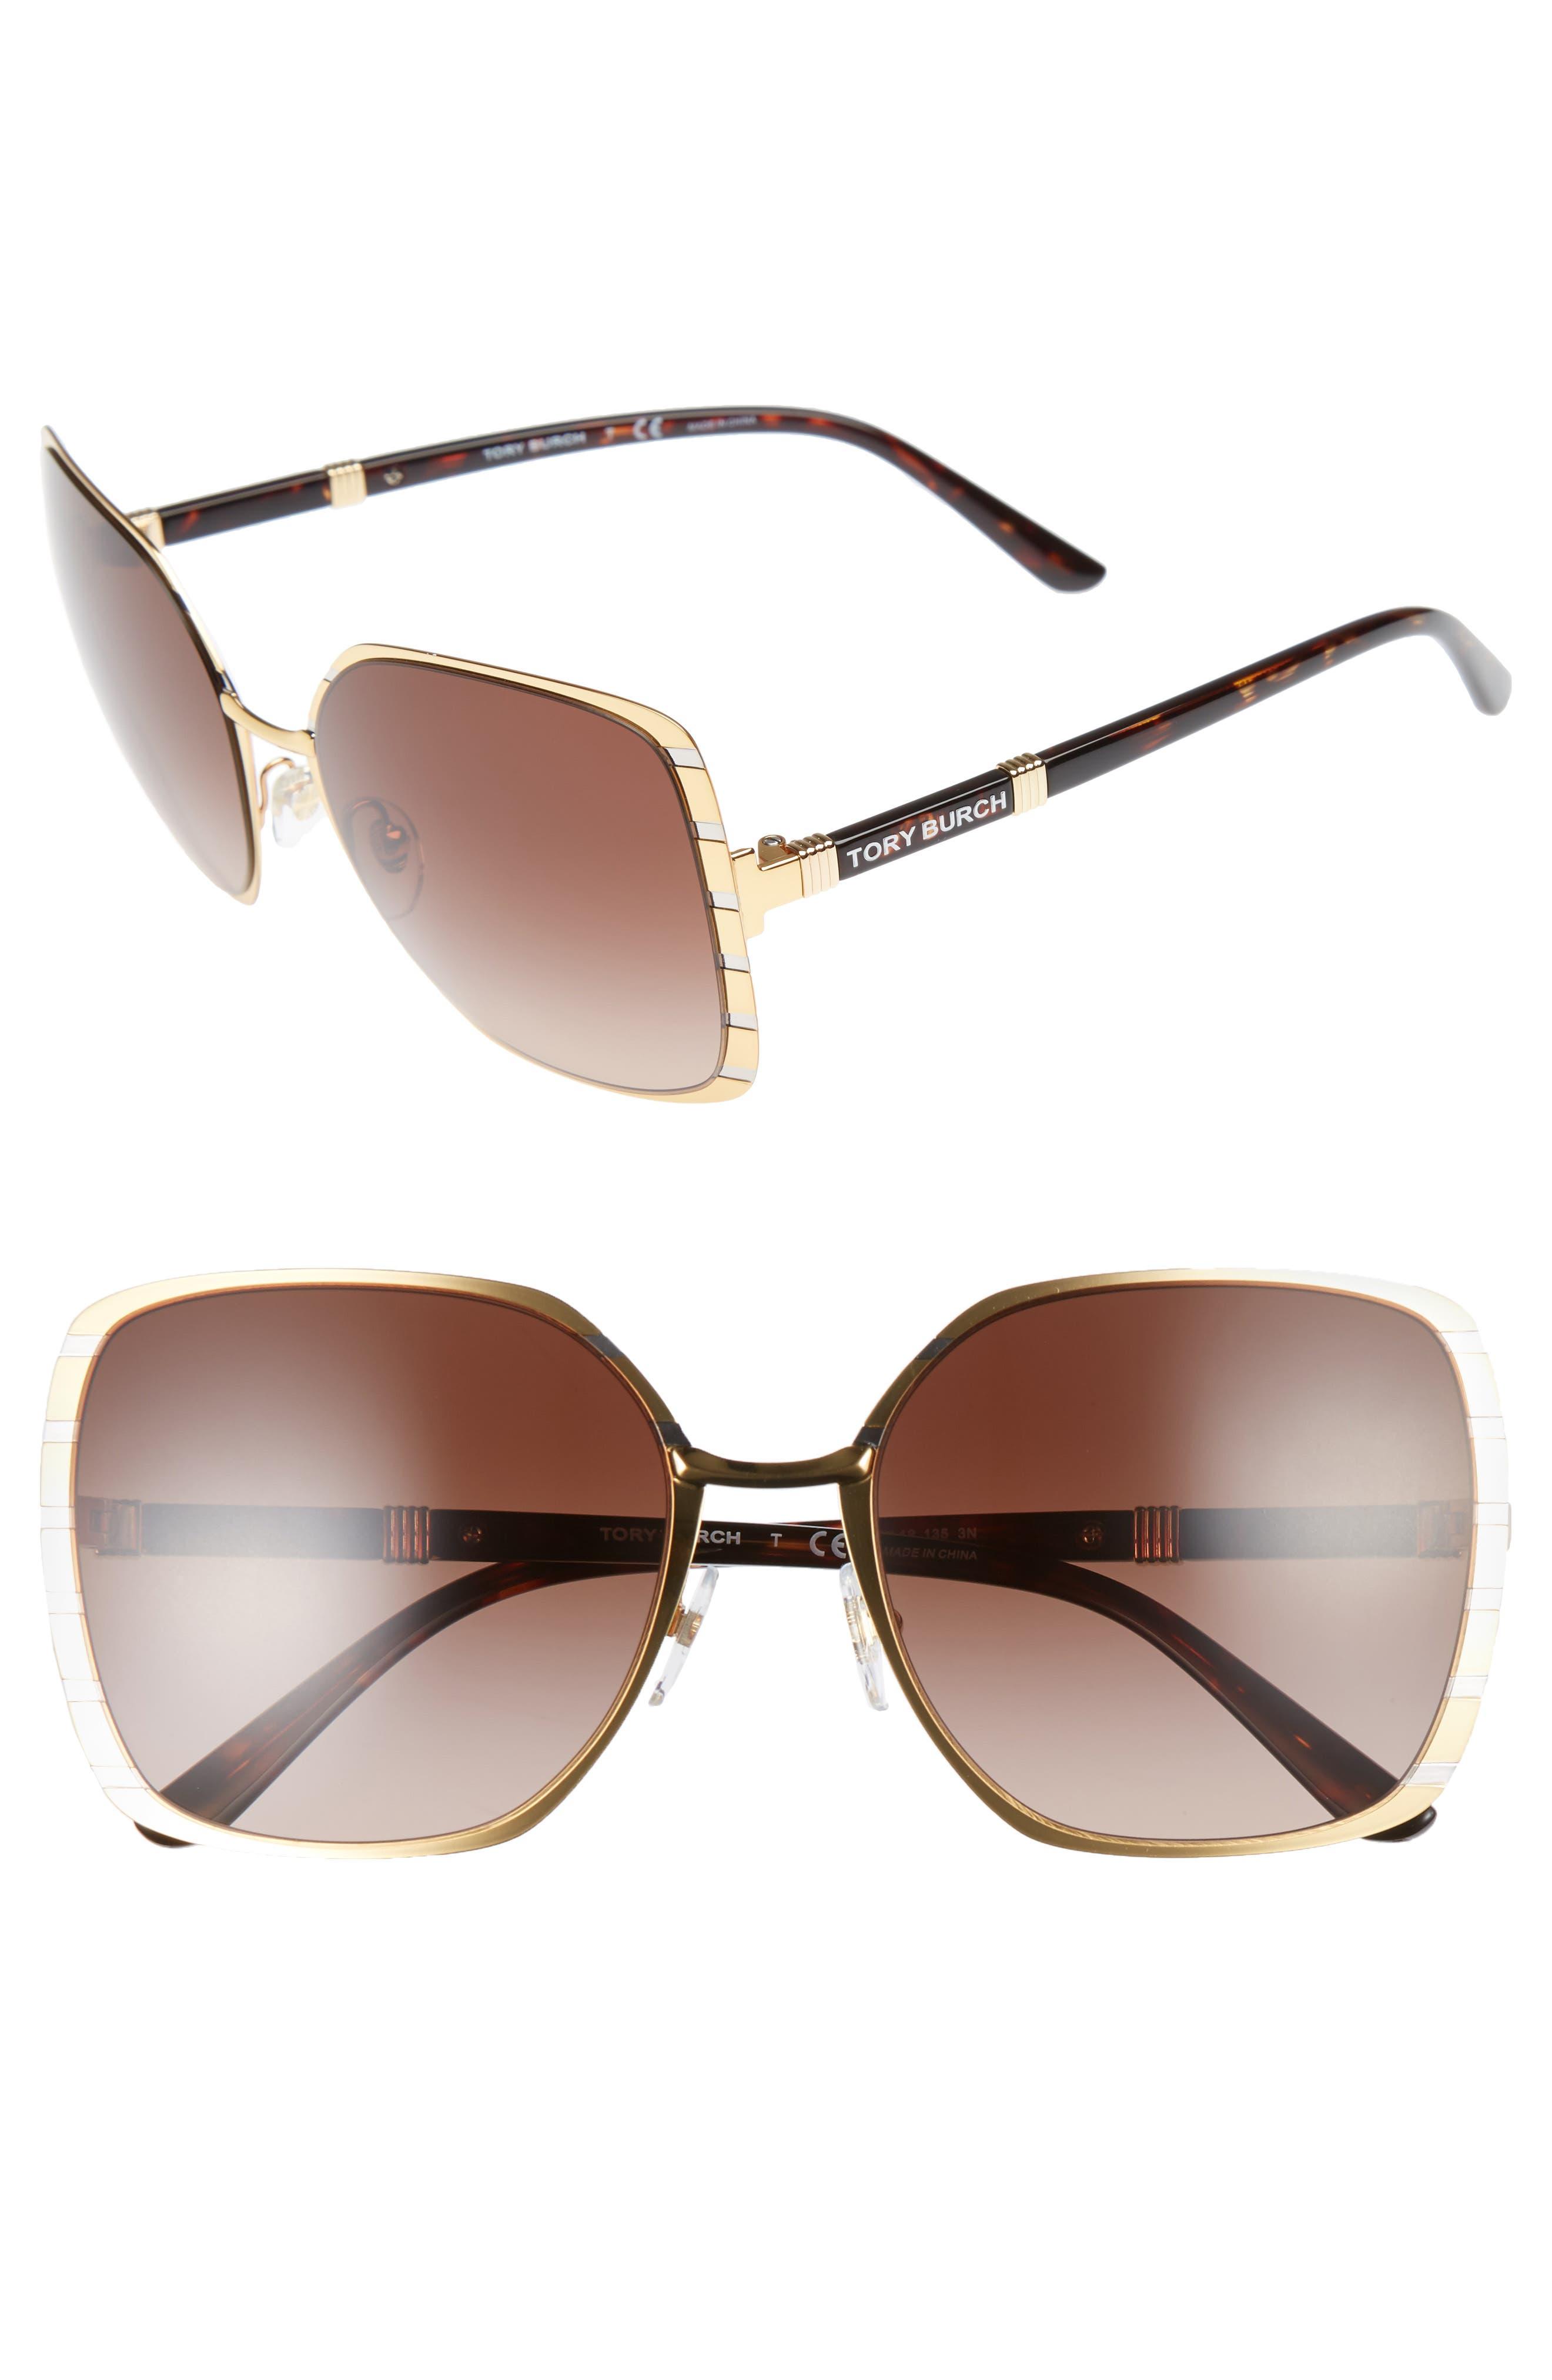 Main Image - Tory Burch 57mm Gradient Square Sunglasses